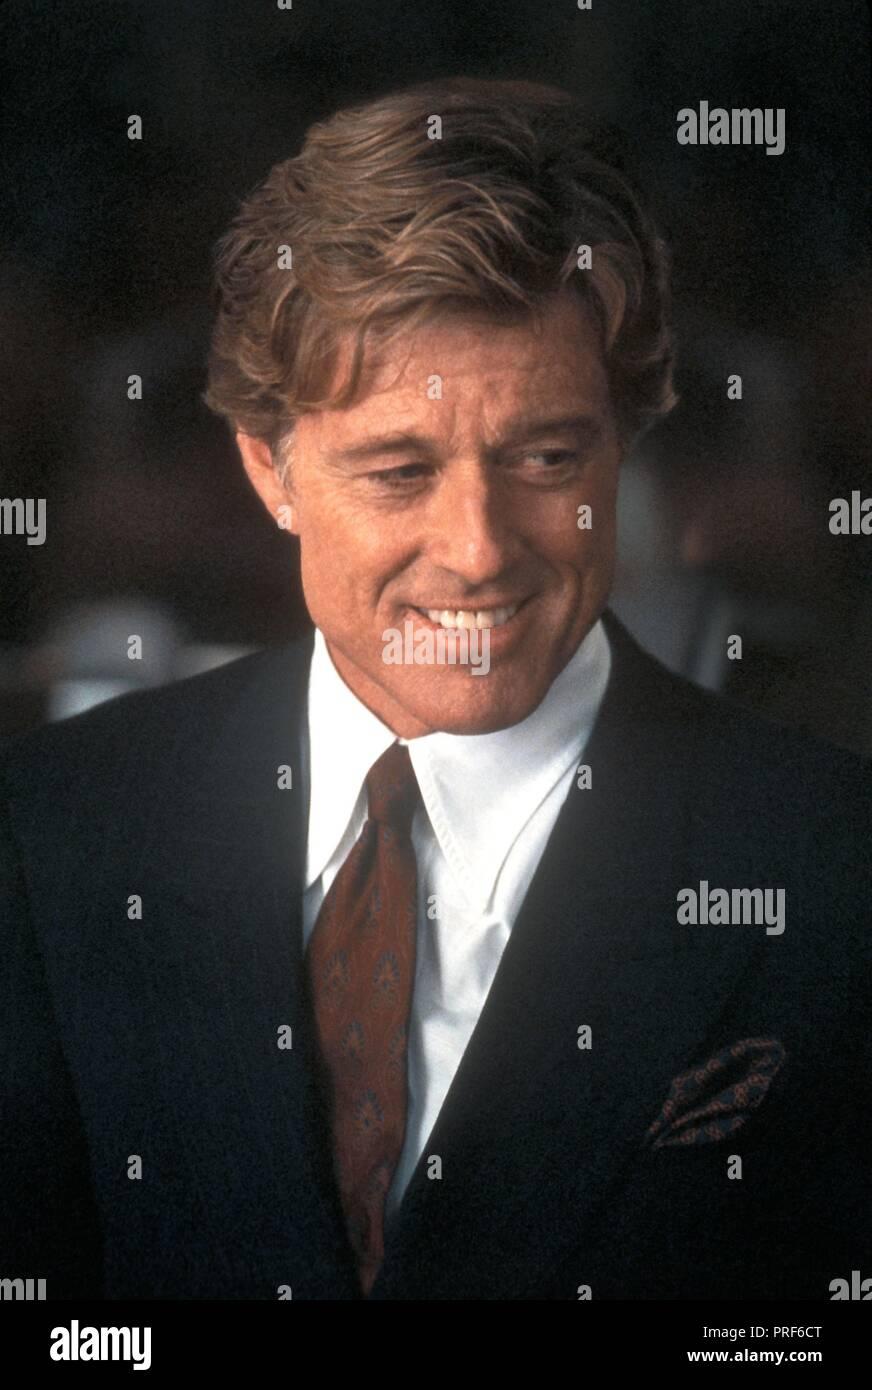 Original film title: INDECENT PROPOSAL. English title: INDECENT PROPOSAL. Year: 1993. Director: ADRIAN LYNE. Stars: ROBERT REDFORD. Credit: PARAMOUNT PICTURES / JAMES, DAVID / Album - Stock Image